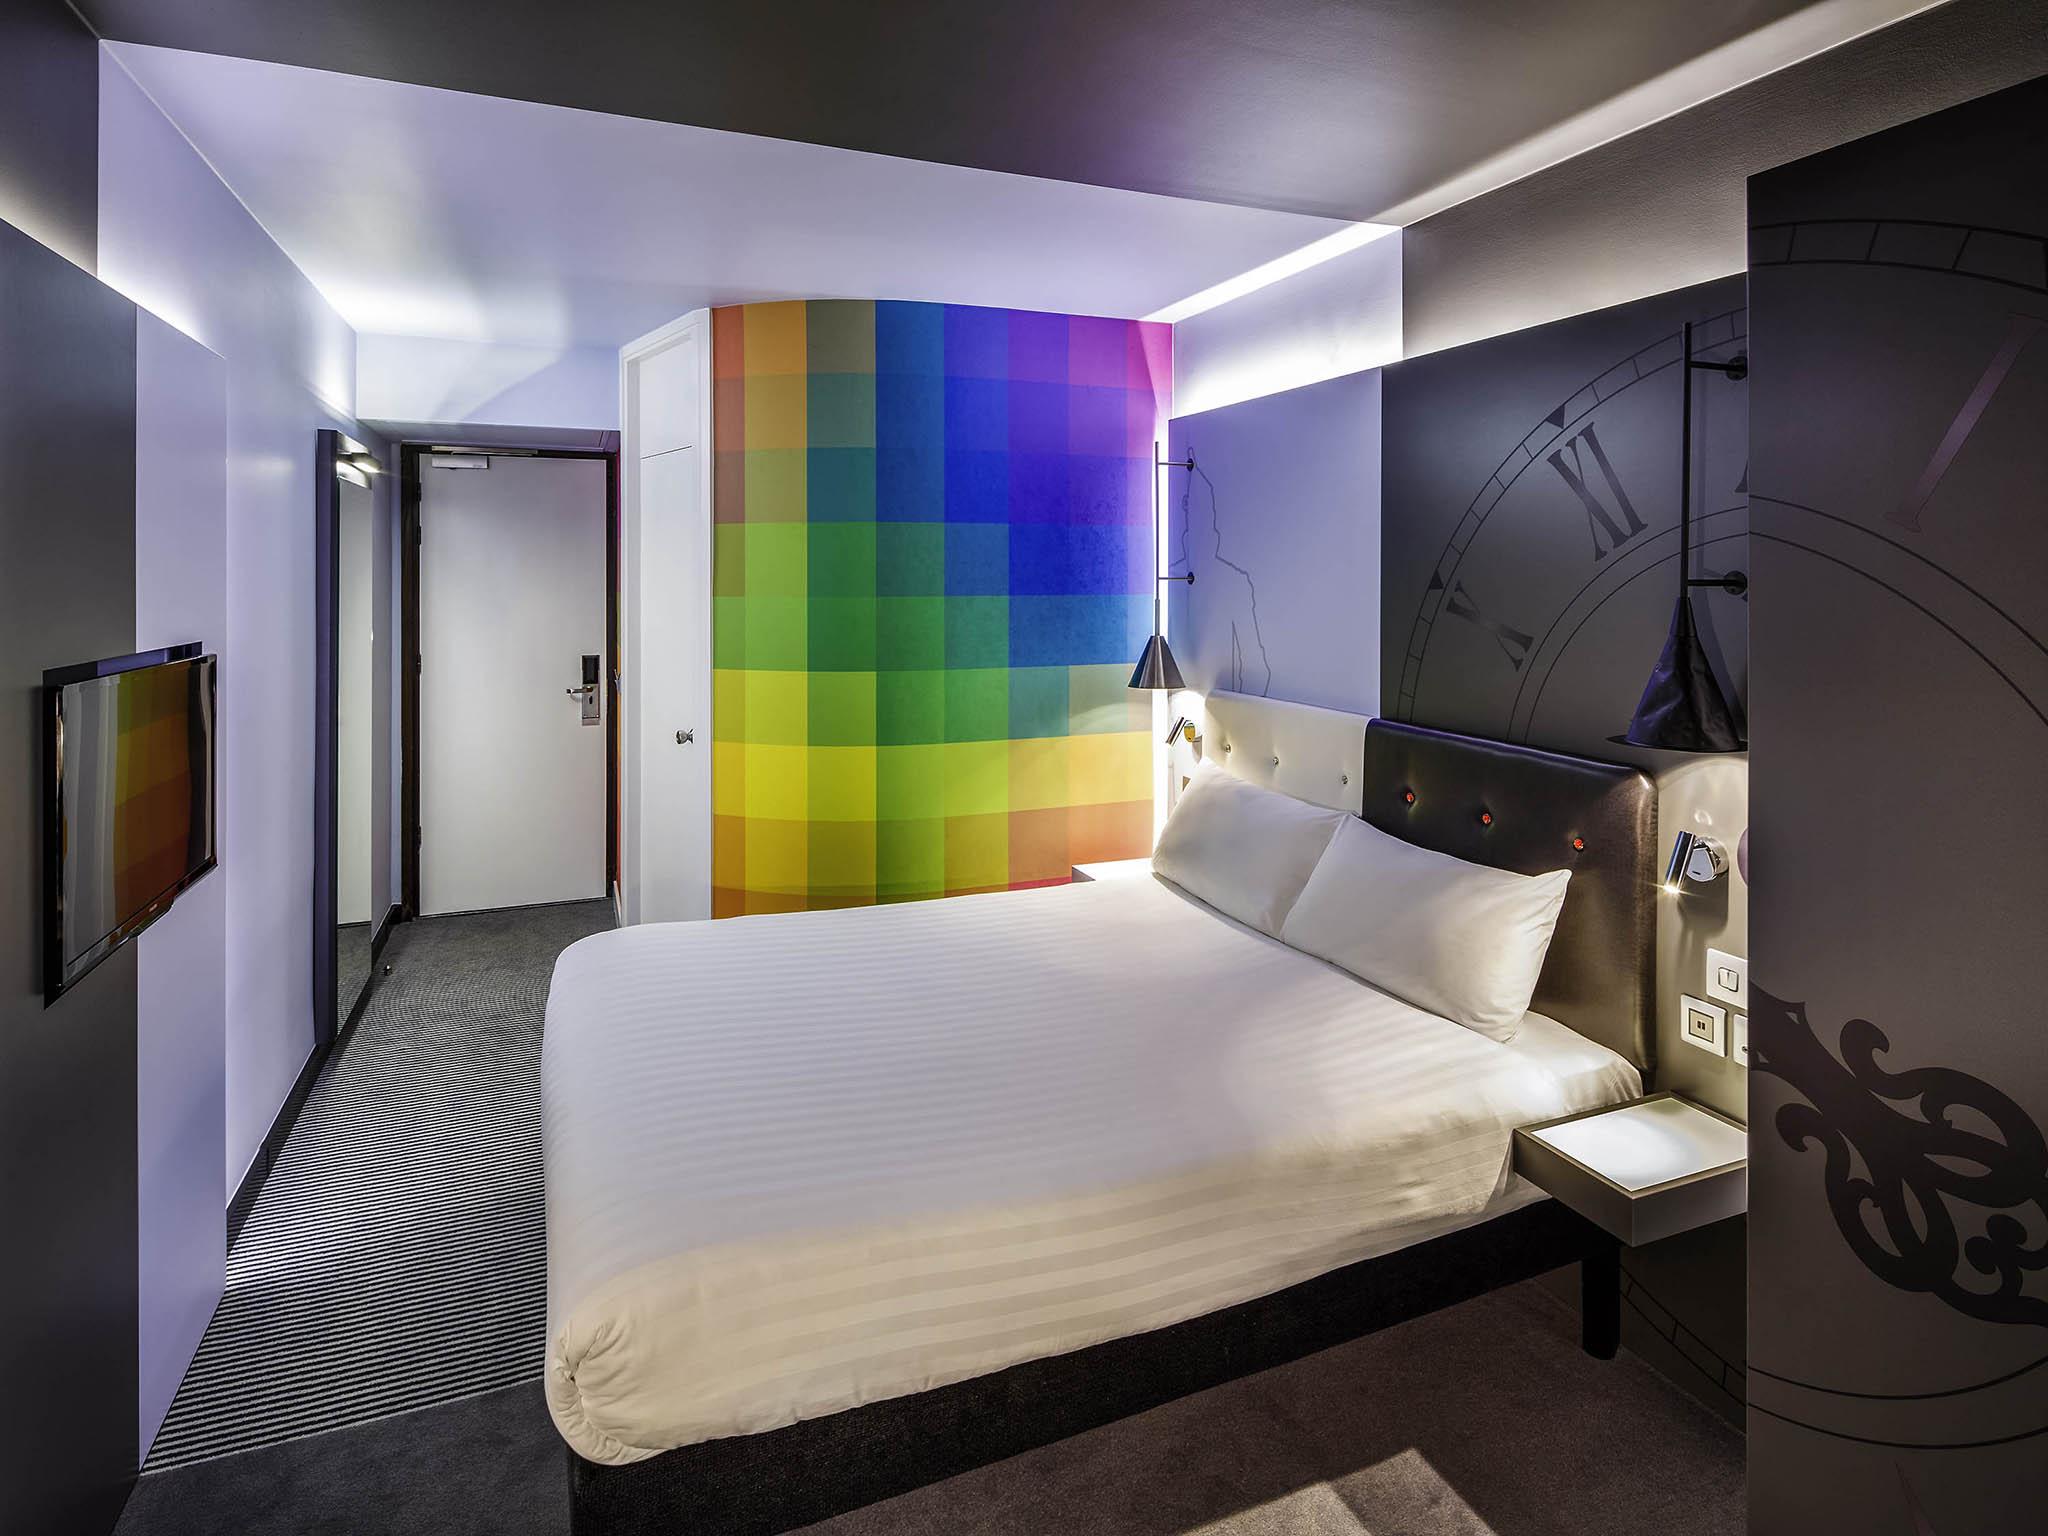 https://www.hotelsbyday.com/_data/default-hotel_image/1/8133/7465-ro-00-p-2048x1536.jpg